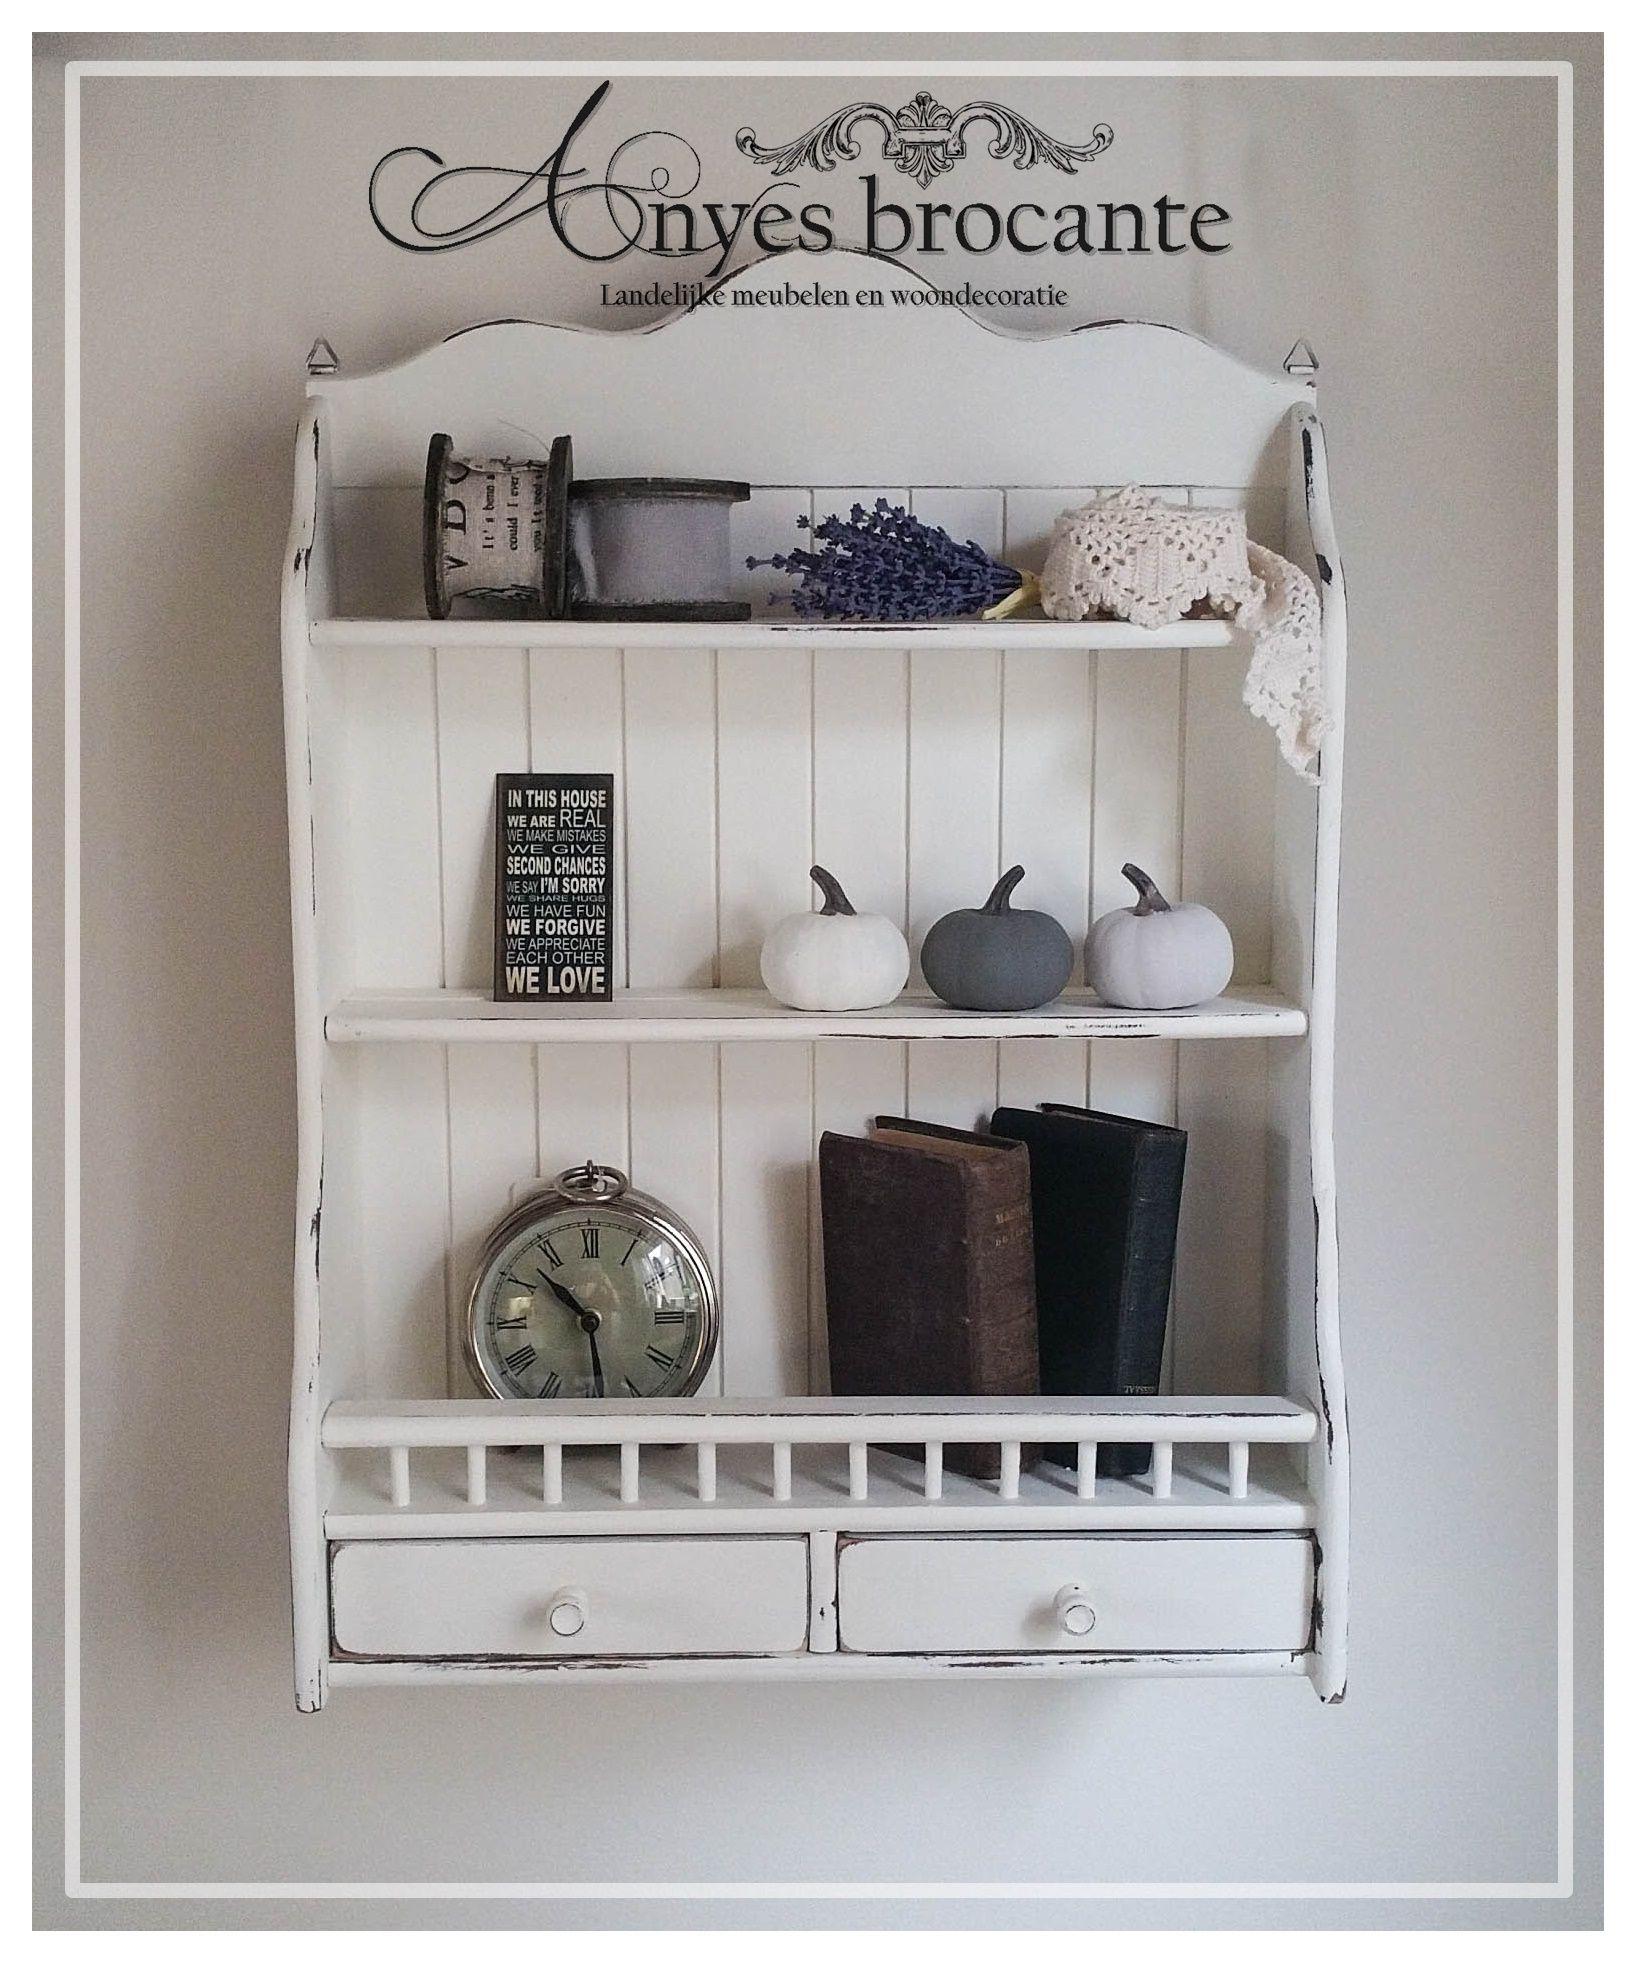 brocante keukenrekje wit â meubelen en kleinmeubelen